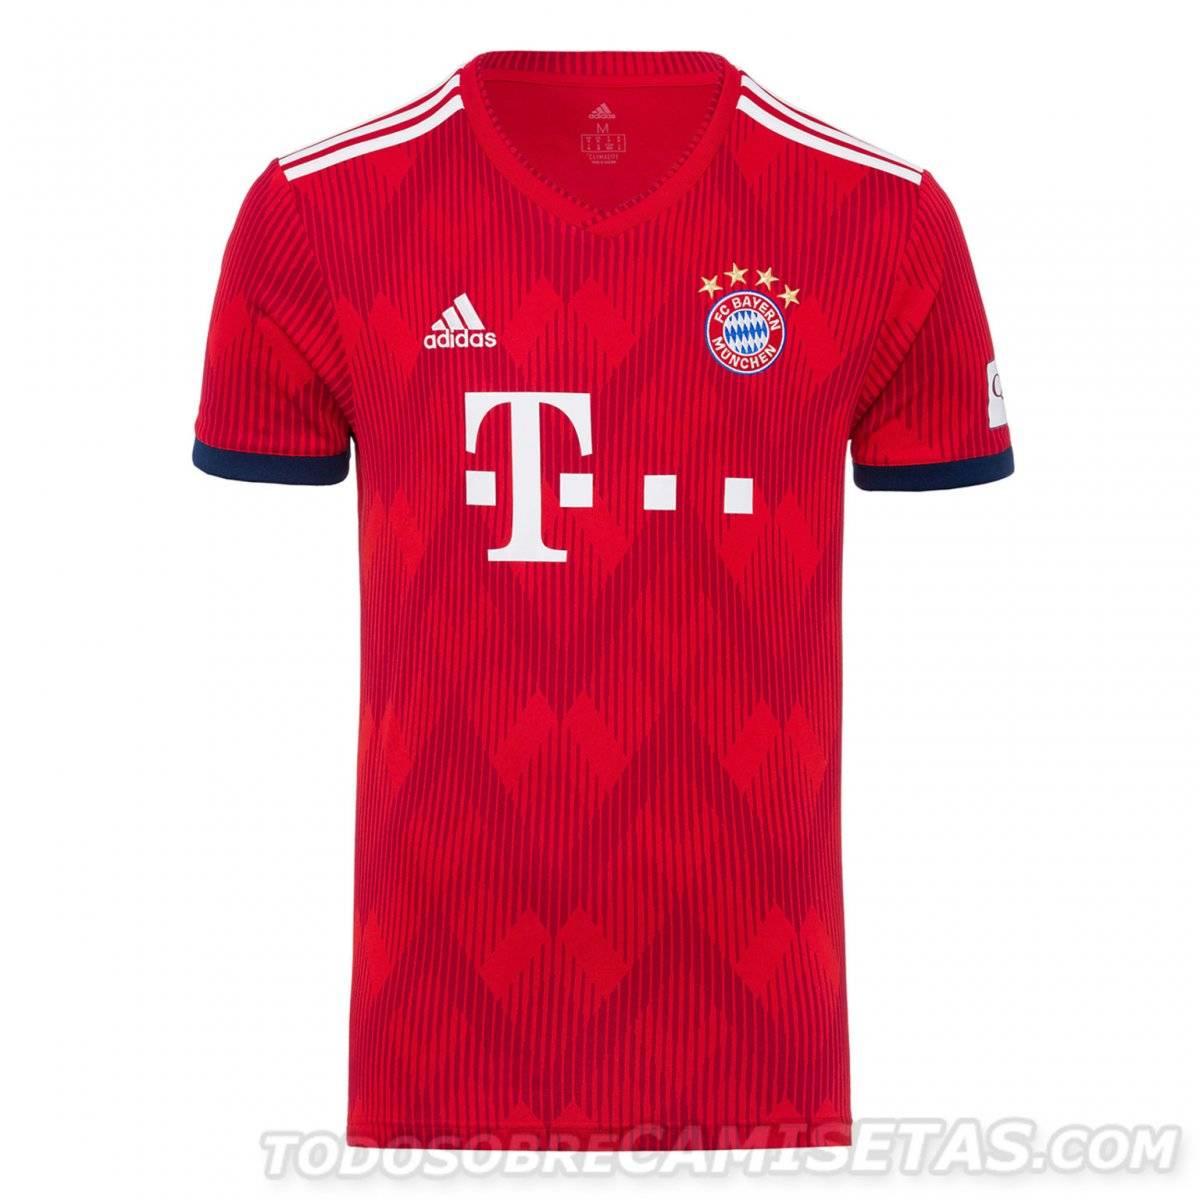 Bayern Munich todosobrecamisetas.com